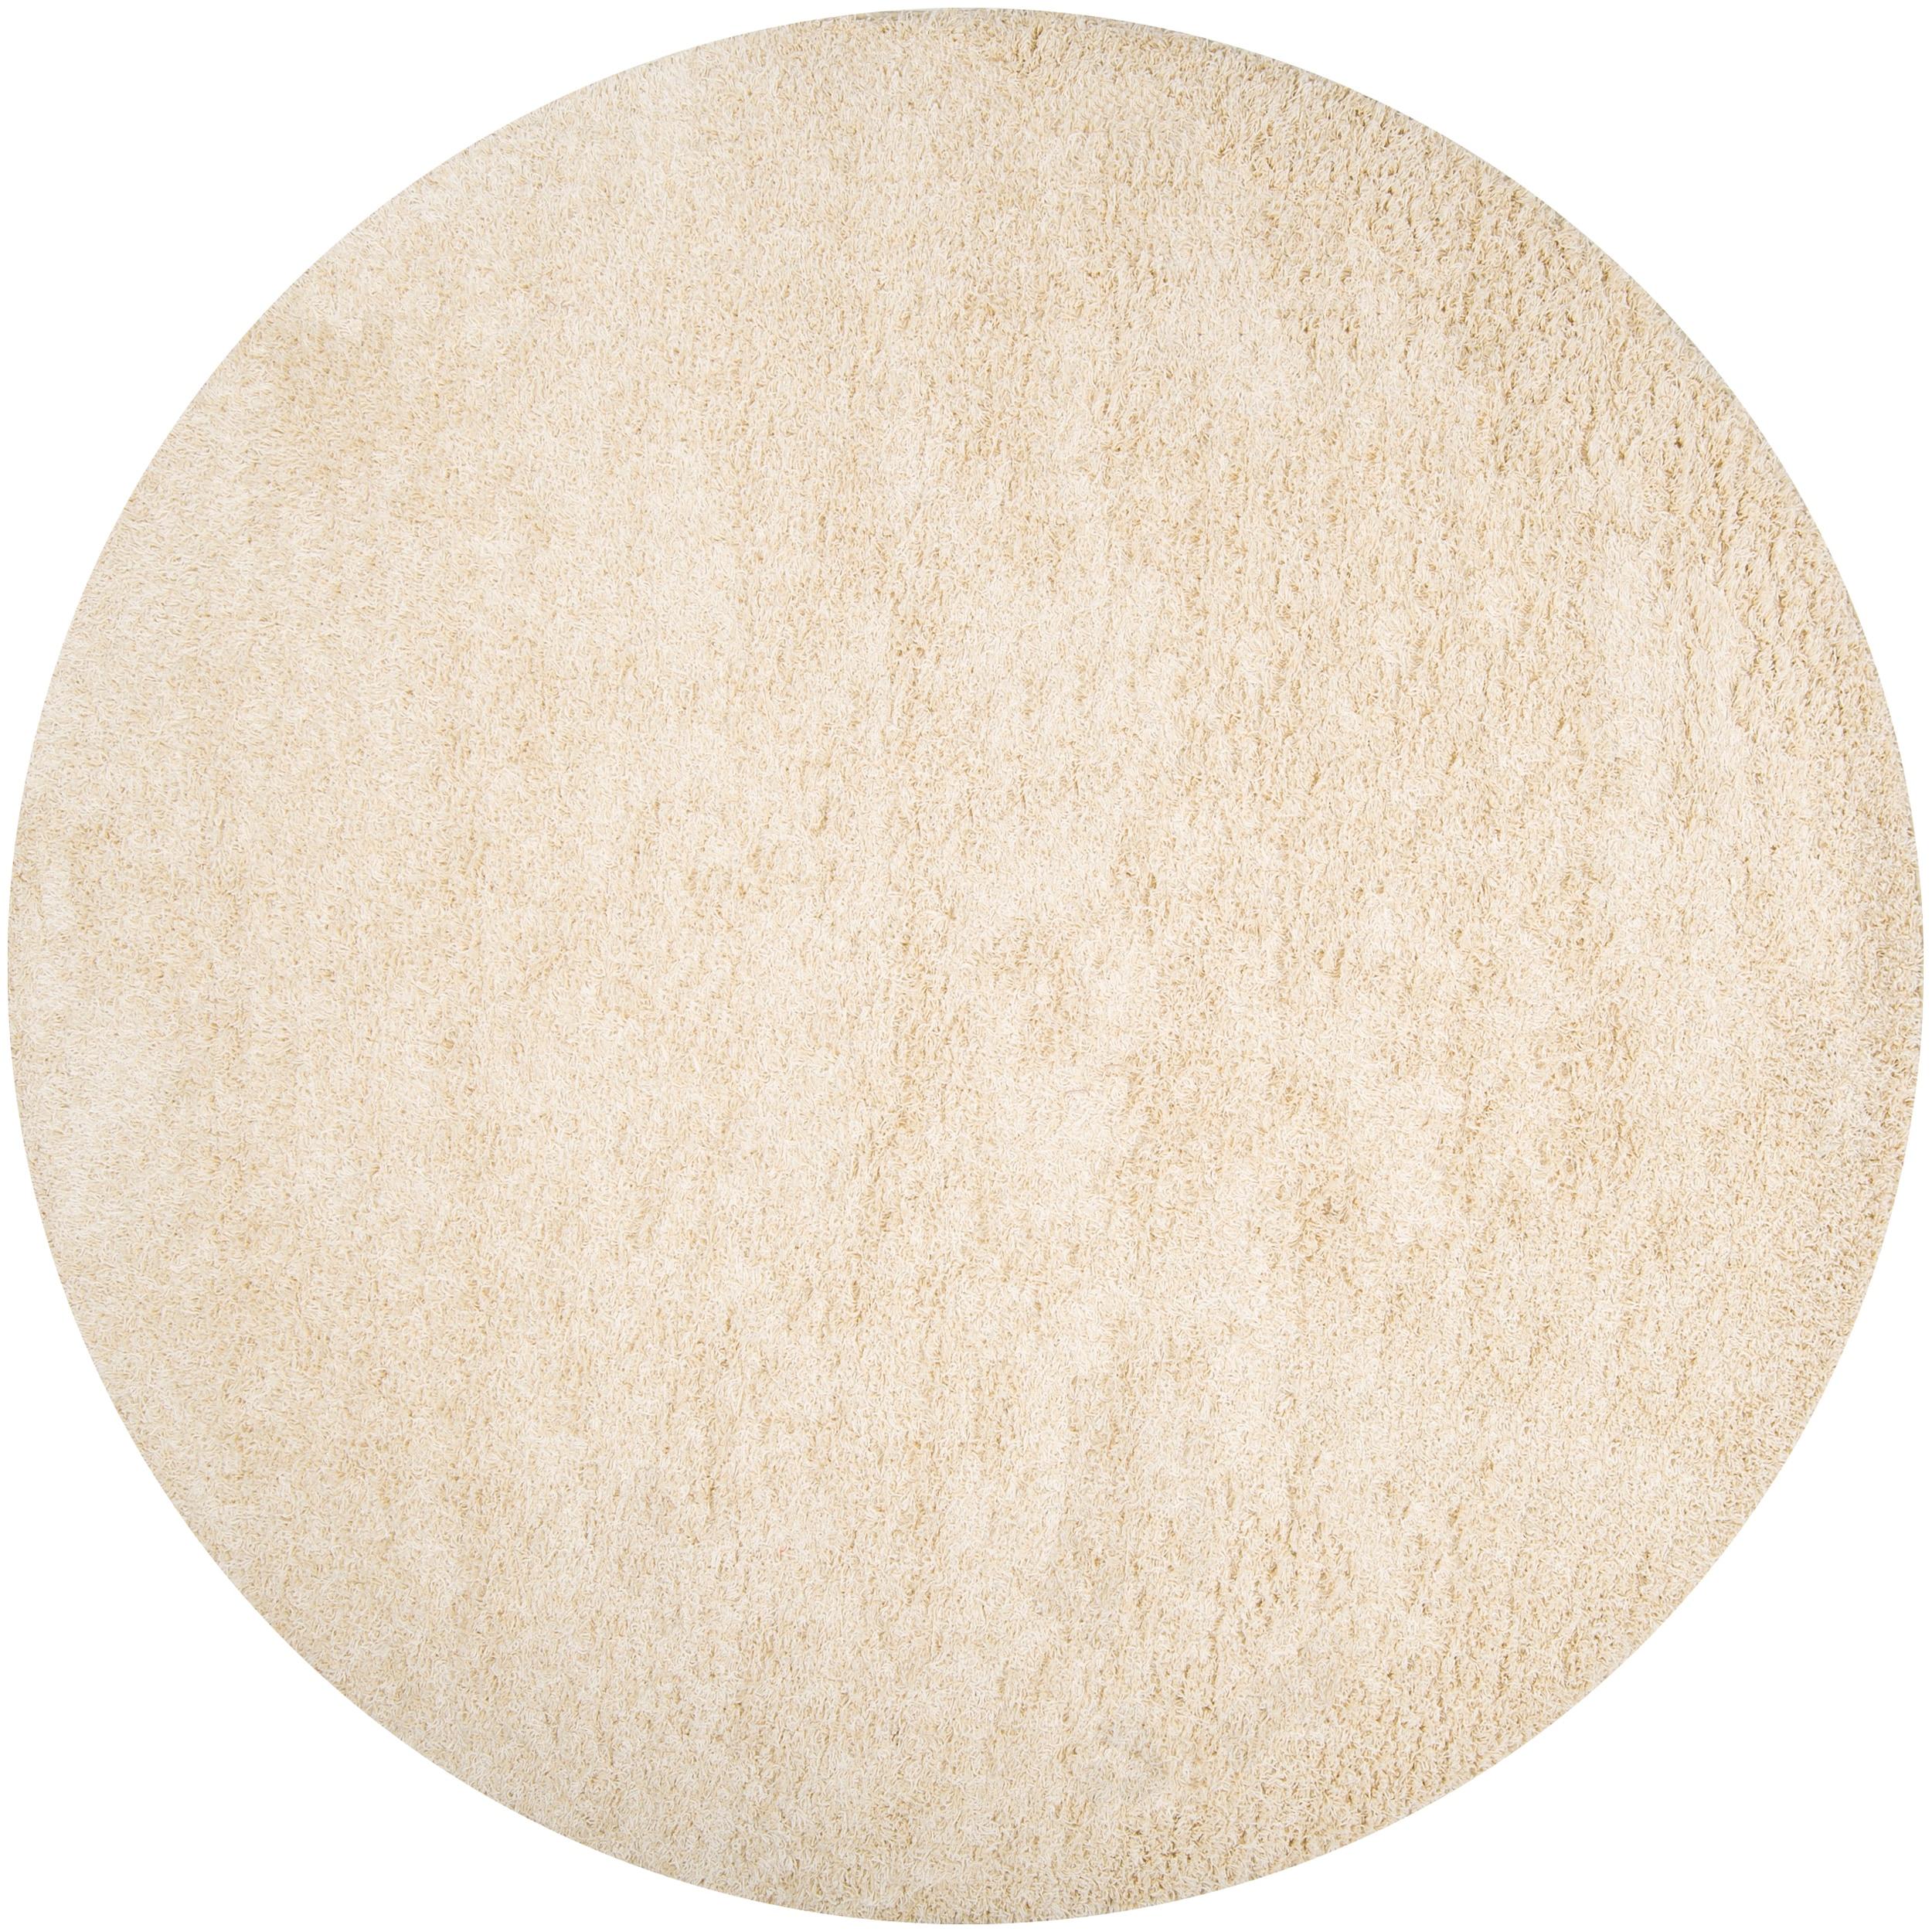 Woven Ivory Debacle Plush Shag (8' Round)